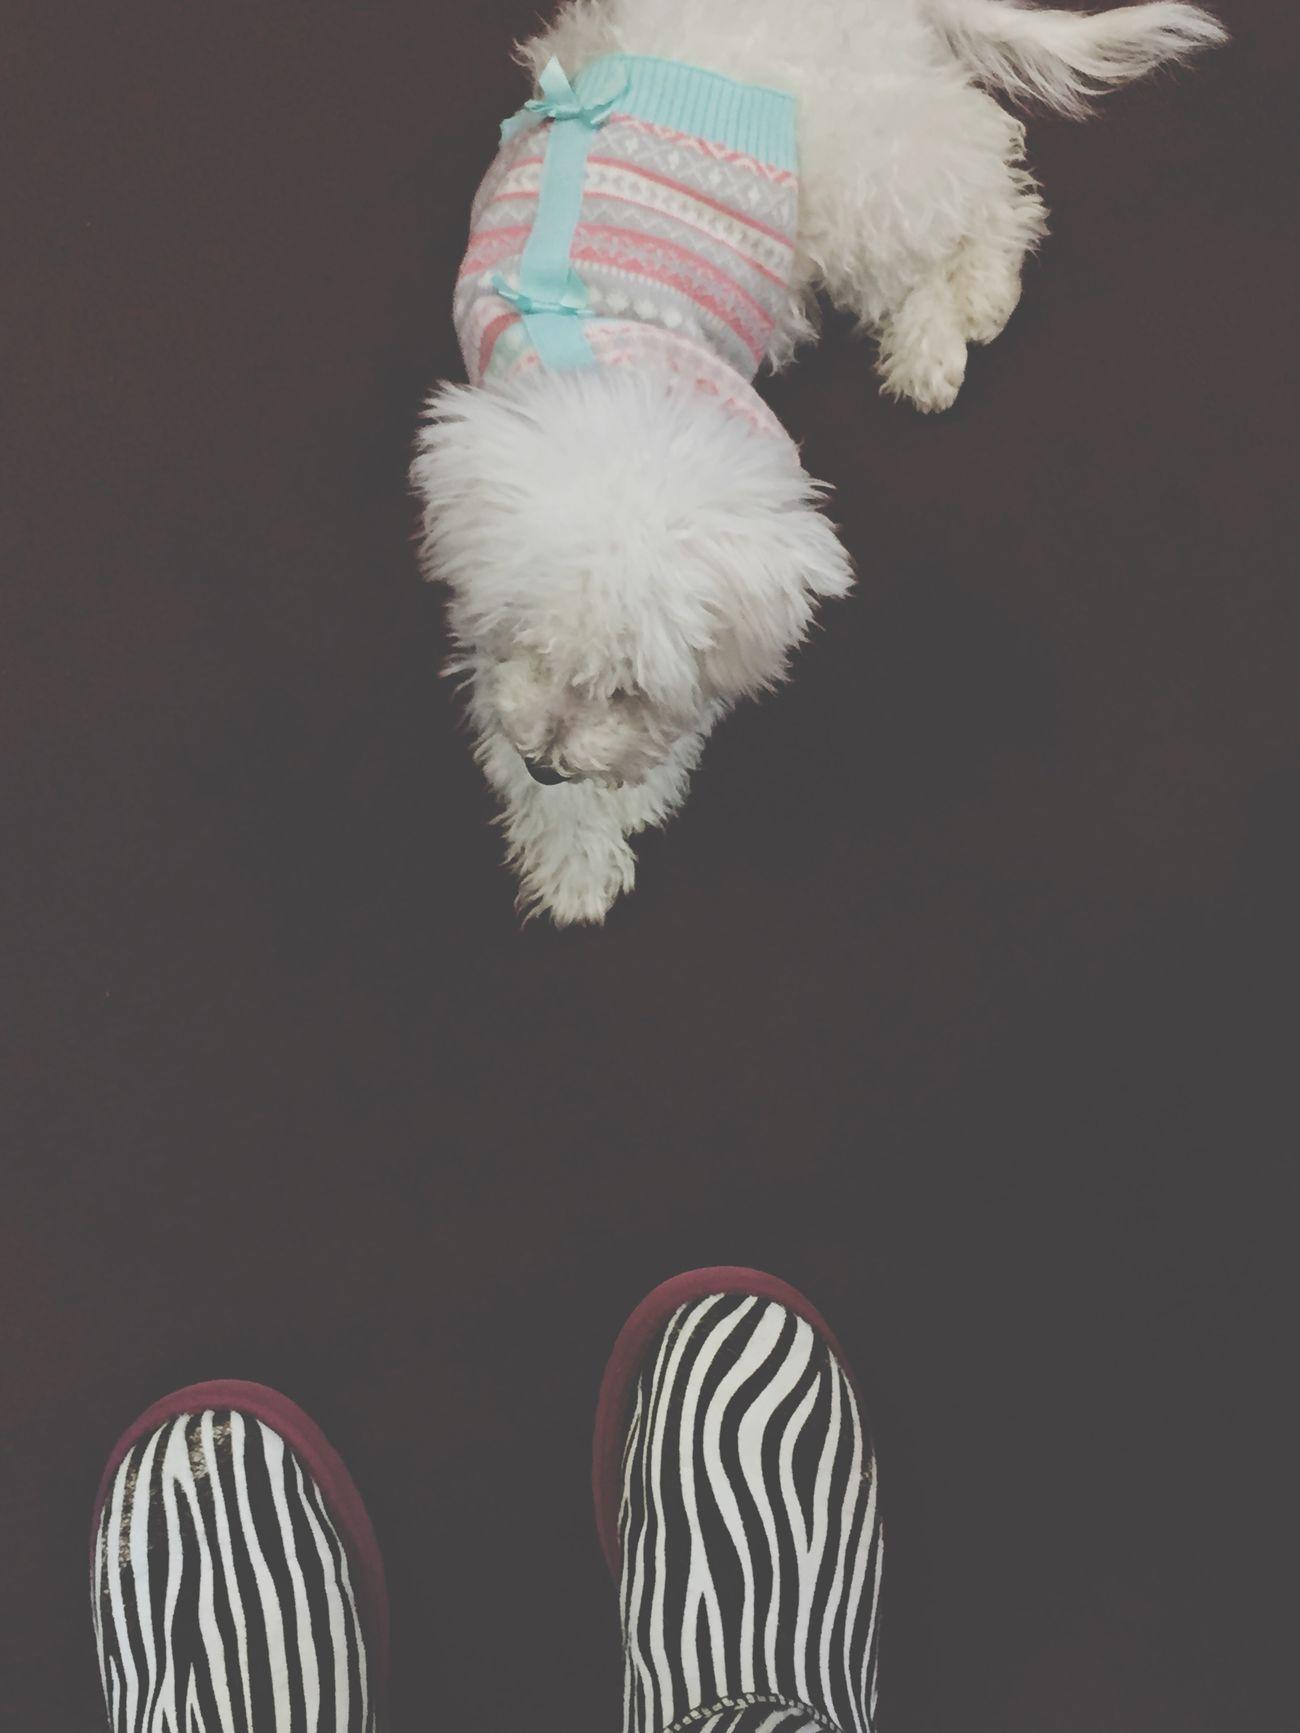 """dugs"" & uggs 😊 Winter Dogs Pets Uggs Zebra Bichonfrise"